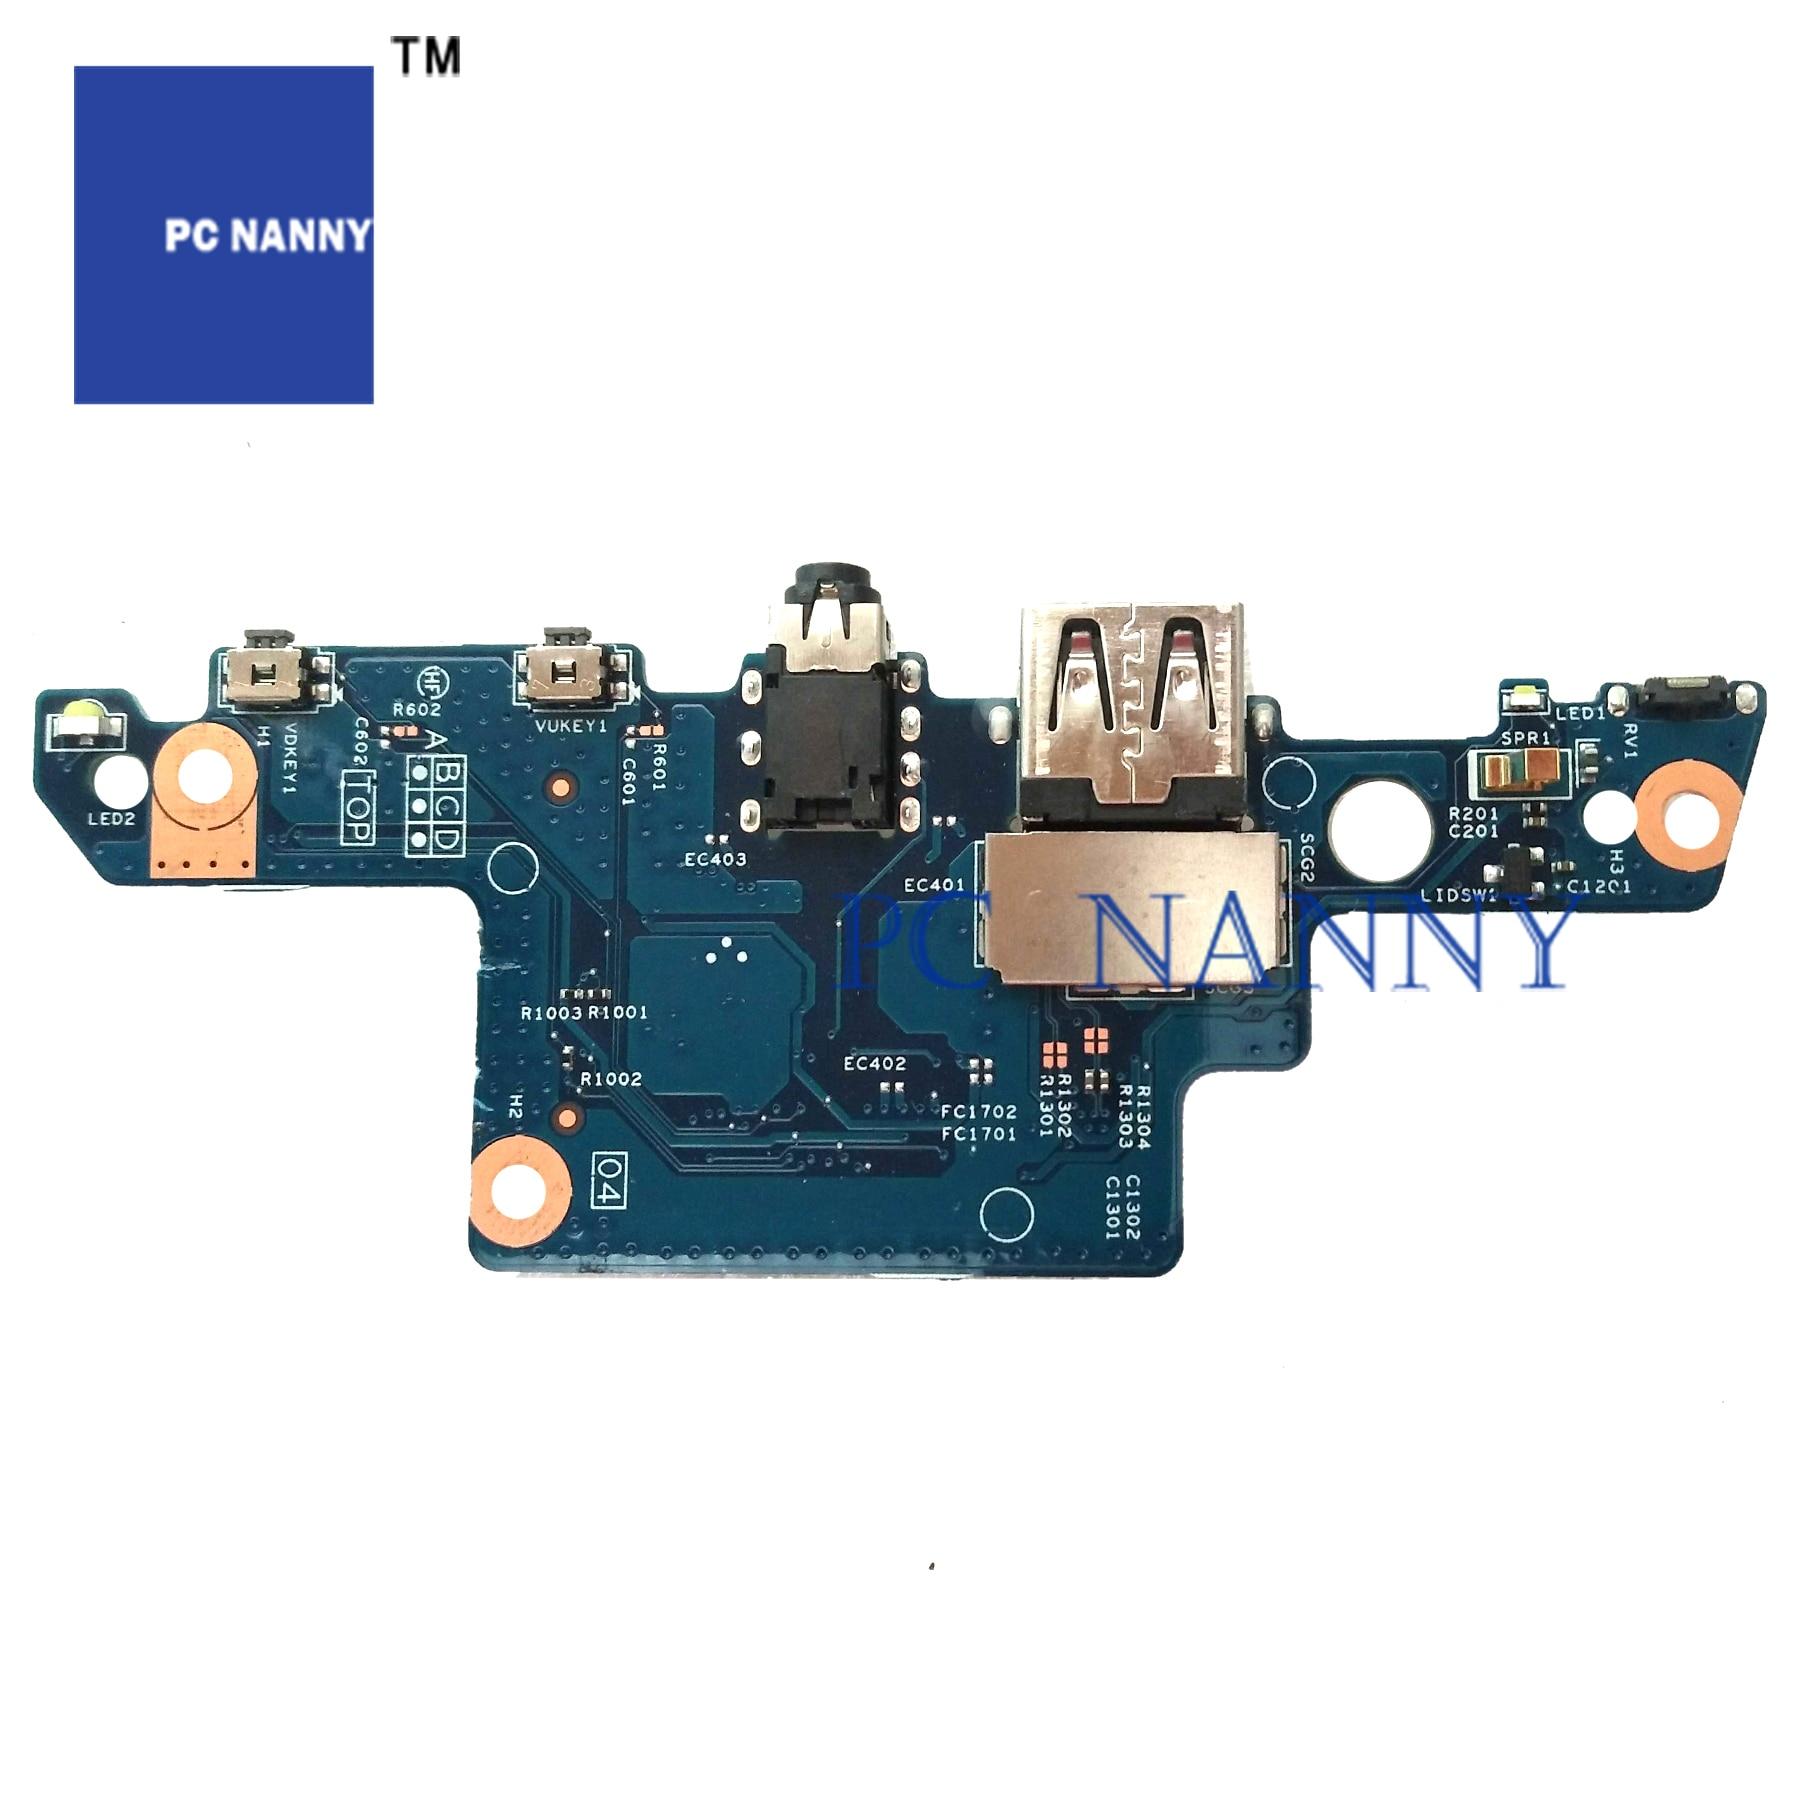 PCNANNY FOR HP ENVY X360 15-AQ M6-AR M6-AQ USB Audio Board Power Button Board 856801-001 test good(China)